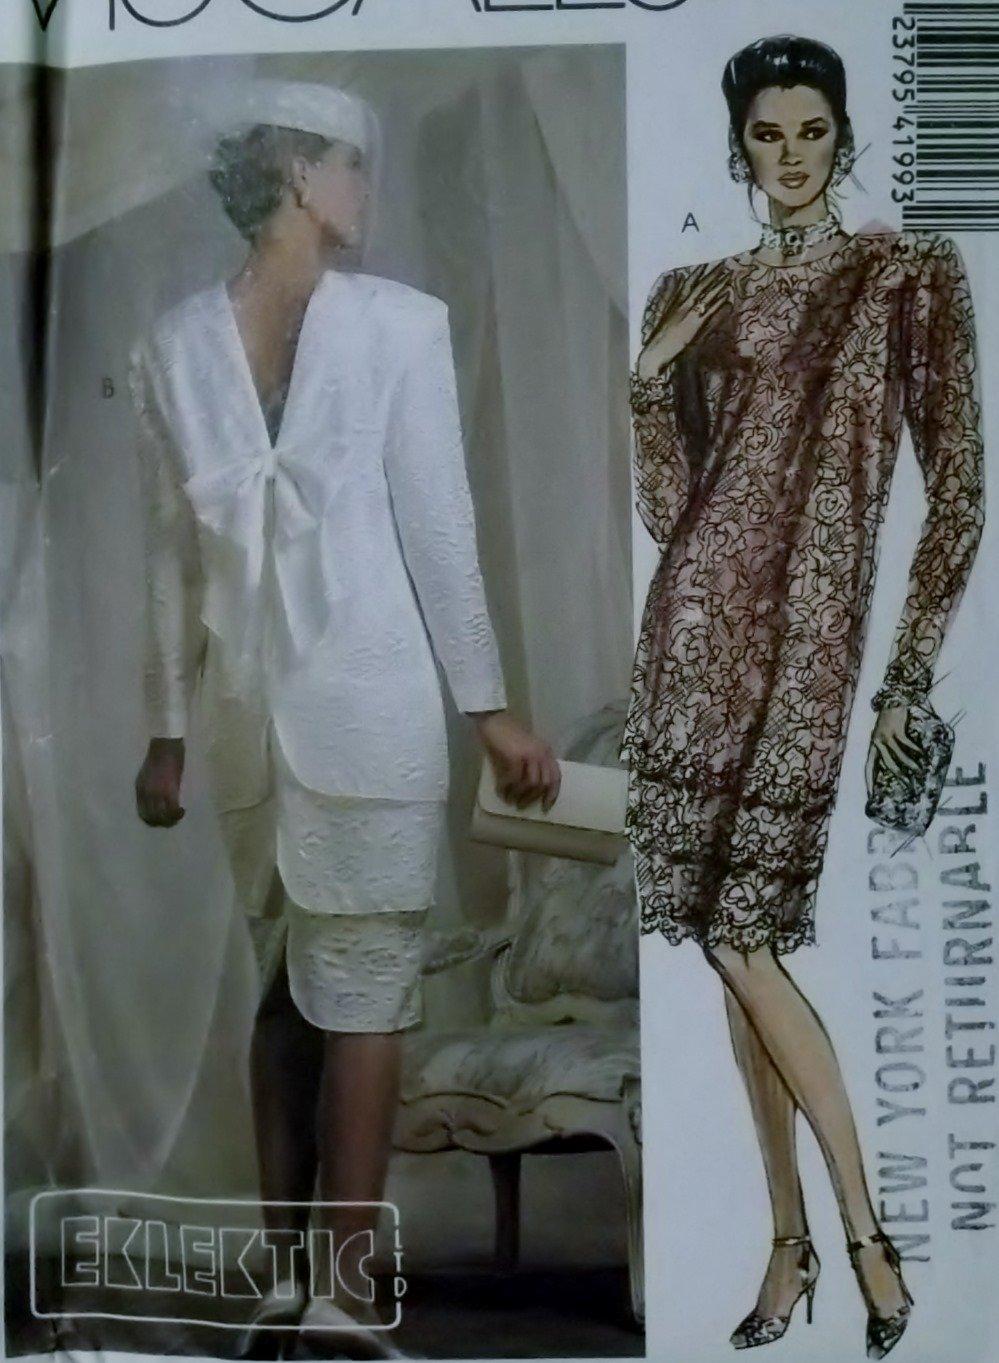 McCalls 4199 Pattern, Misses Eklektic Design Dress with Three Tiers, Size 12, UNCUT